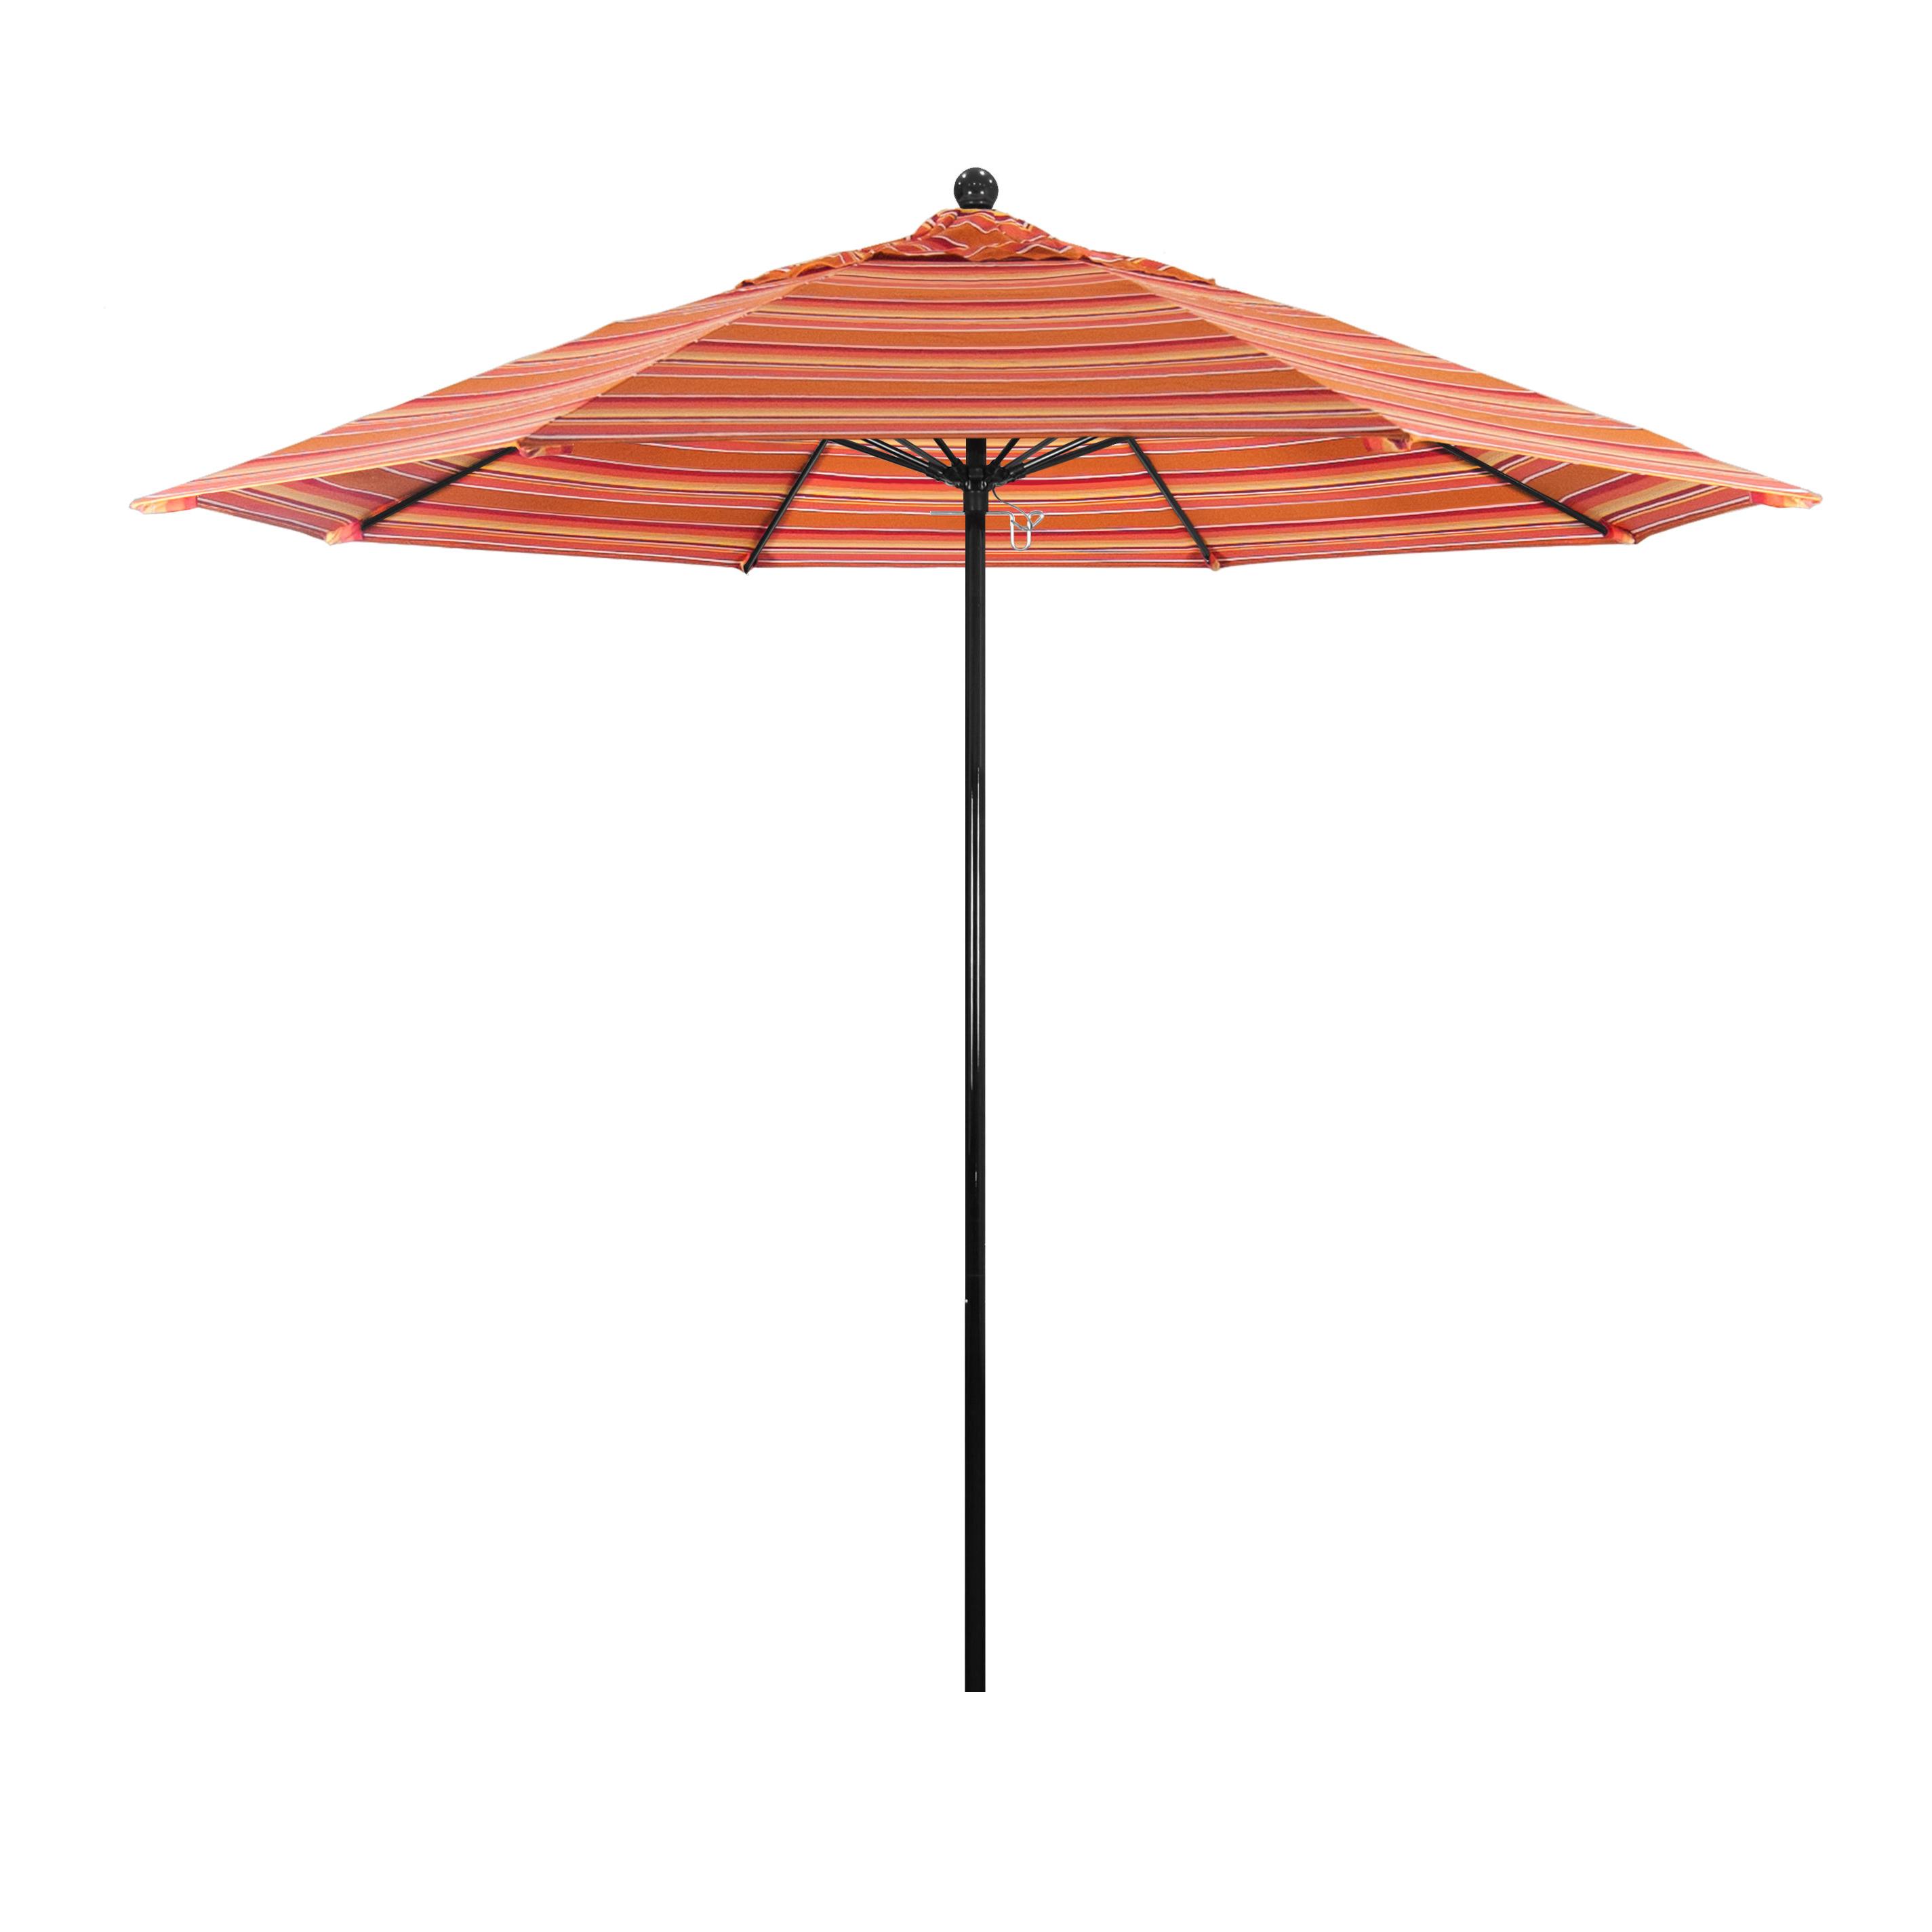 Popular Lizarraga Market Umbrellas In Oceanside Series 9' Market Sunbrella Umbrella (View 19 of 20)